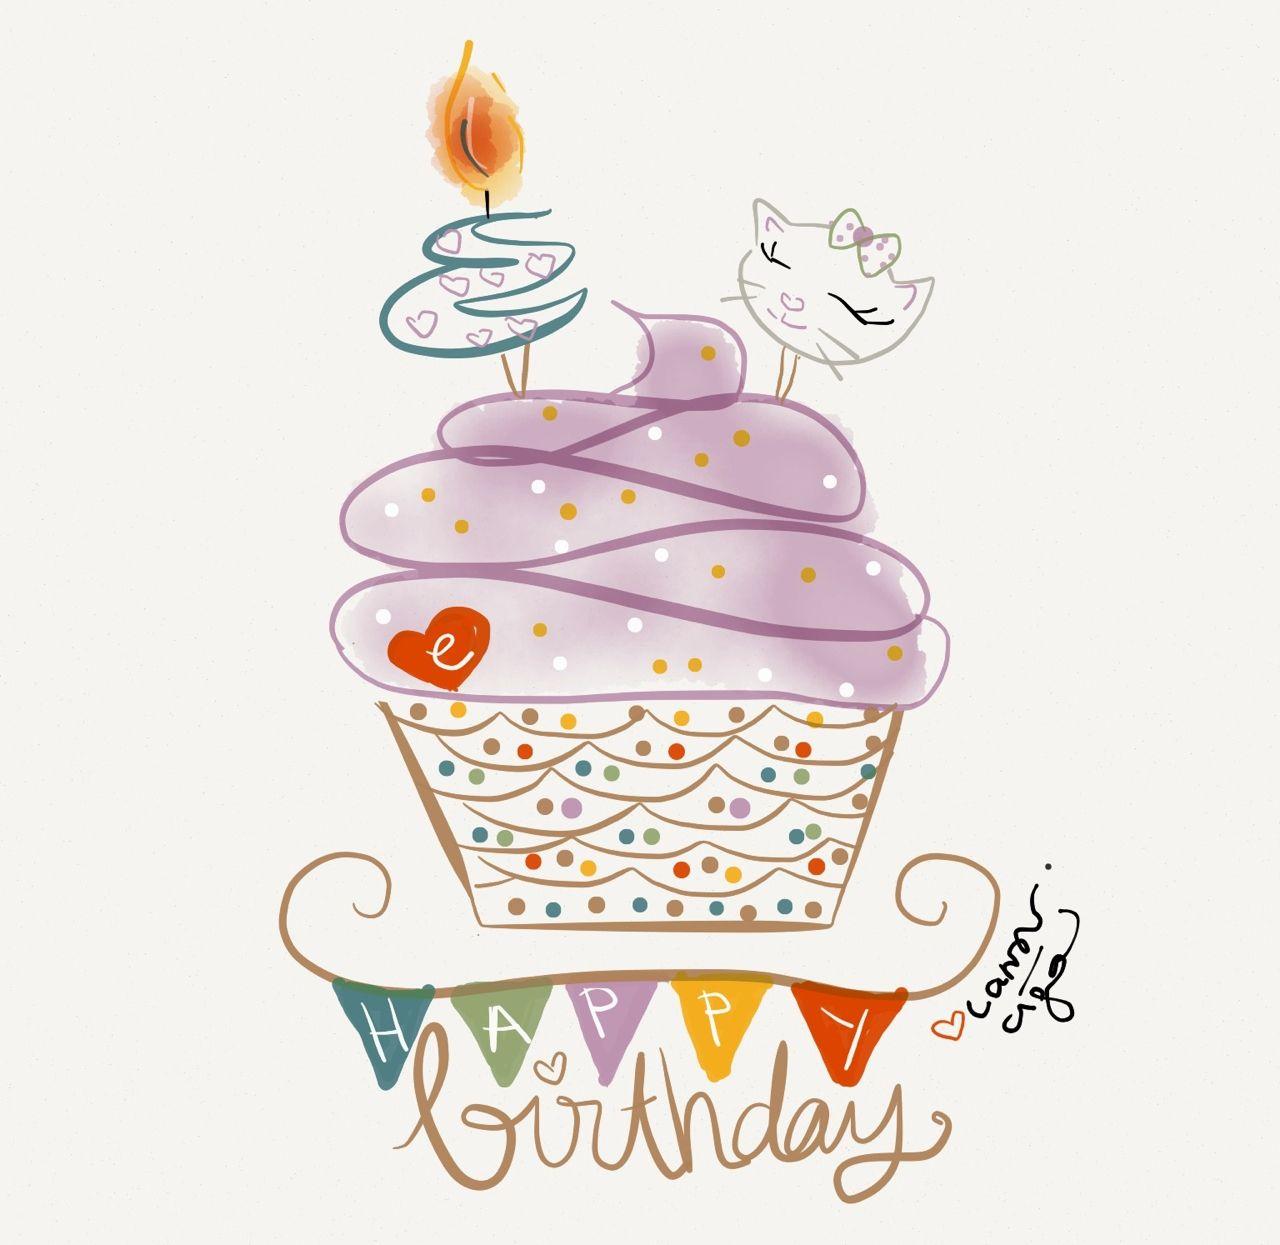 birthday design - Google Search | Envelope Art | Pinterest ...